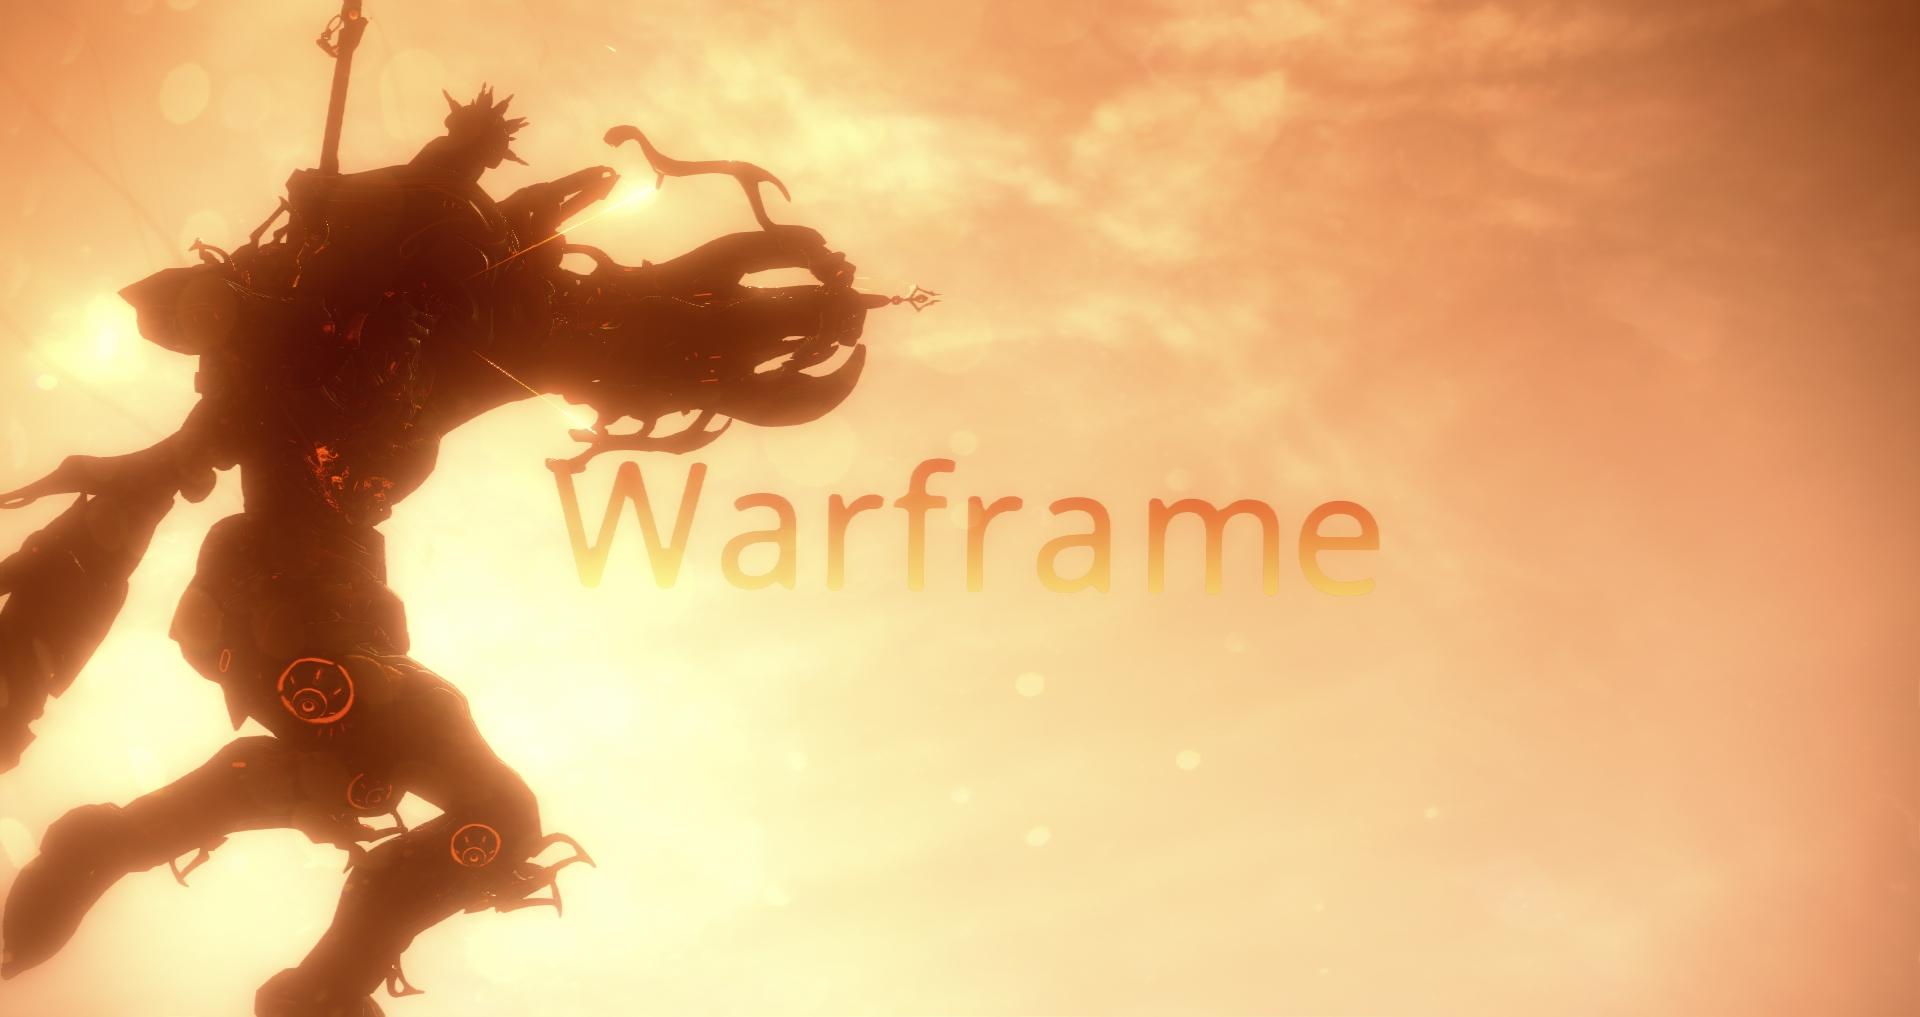 Warframe0009.jpg